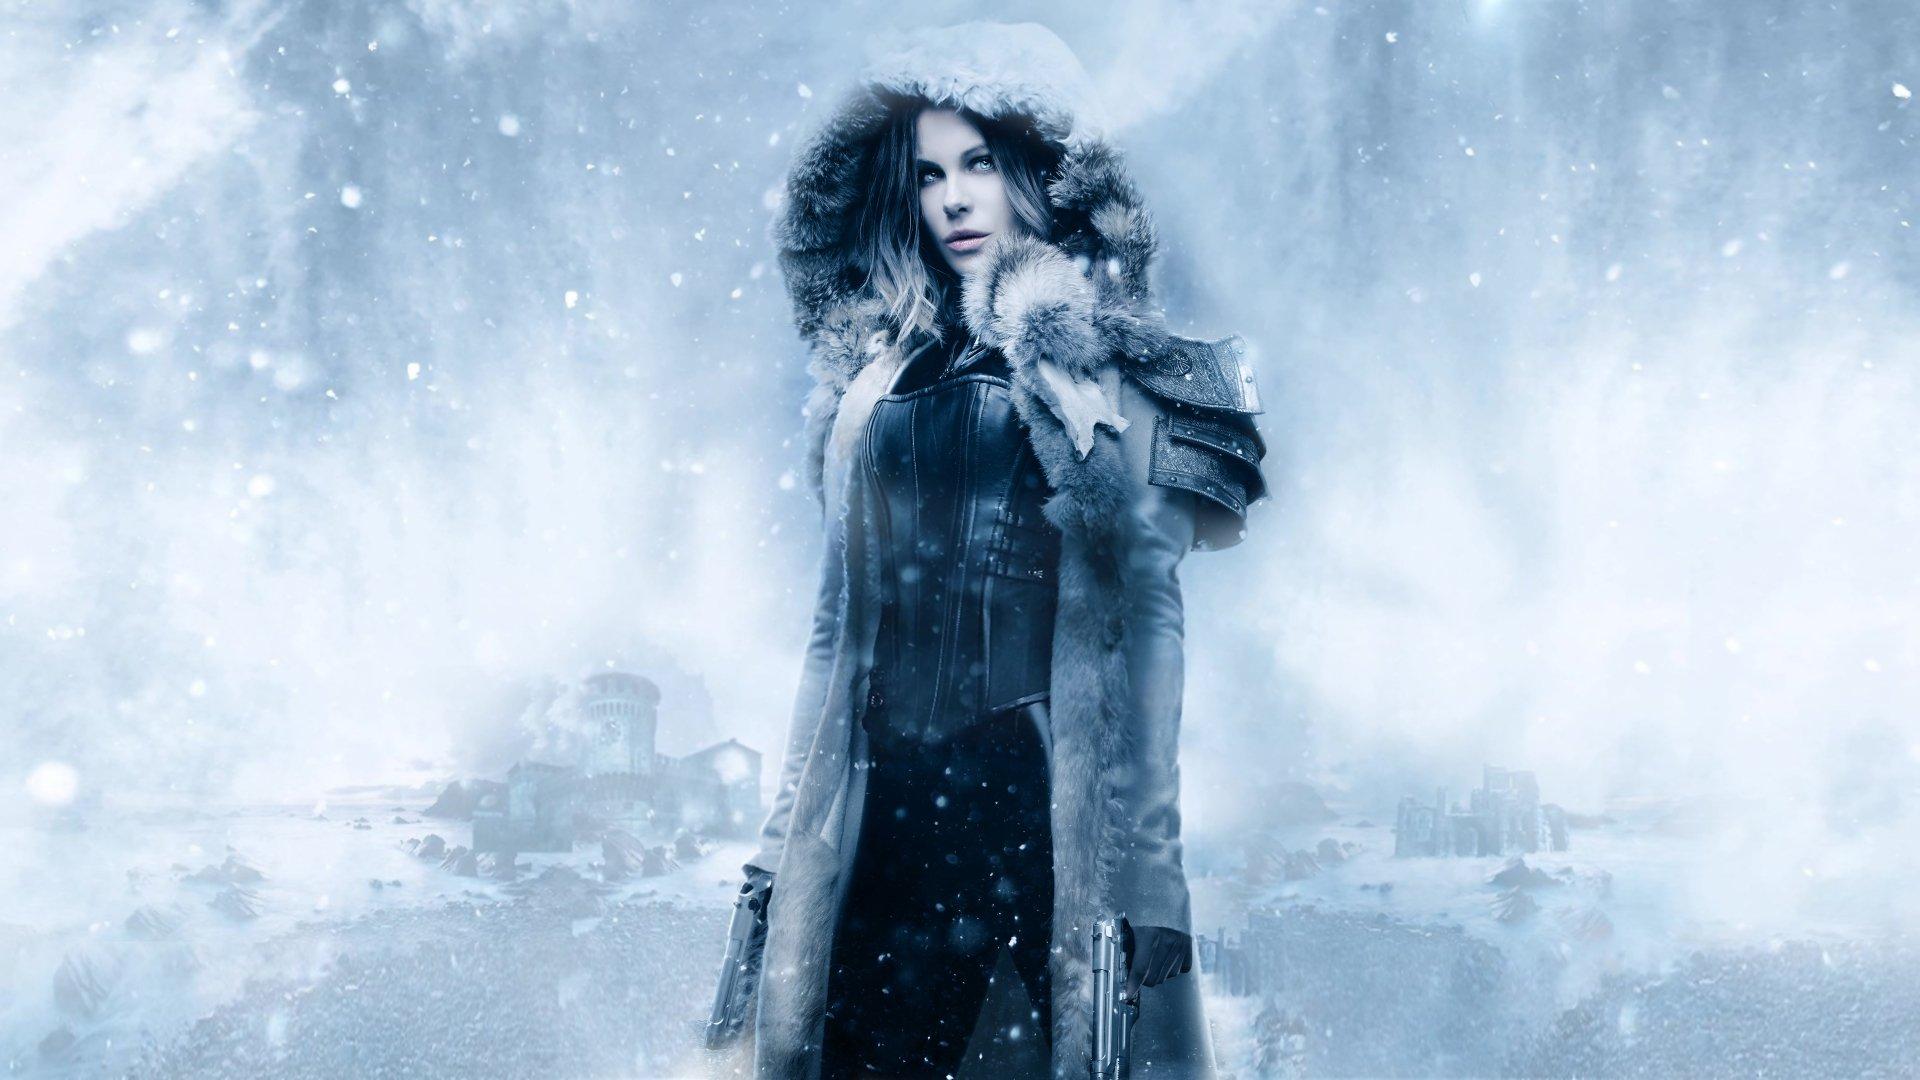 Movie - Underworld: Blood Wars  Selene (Underworld) Kate Beckinsale Wallpaper